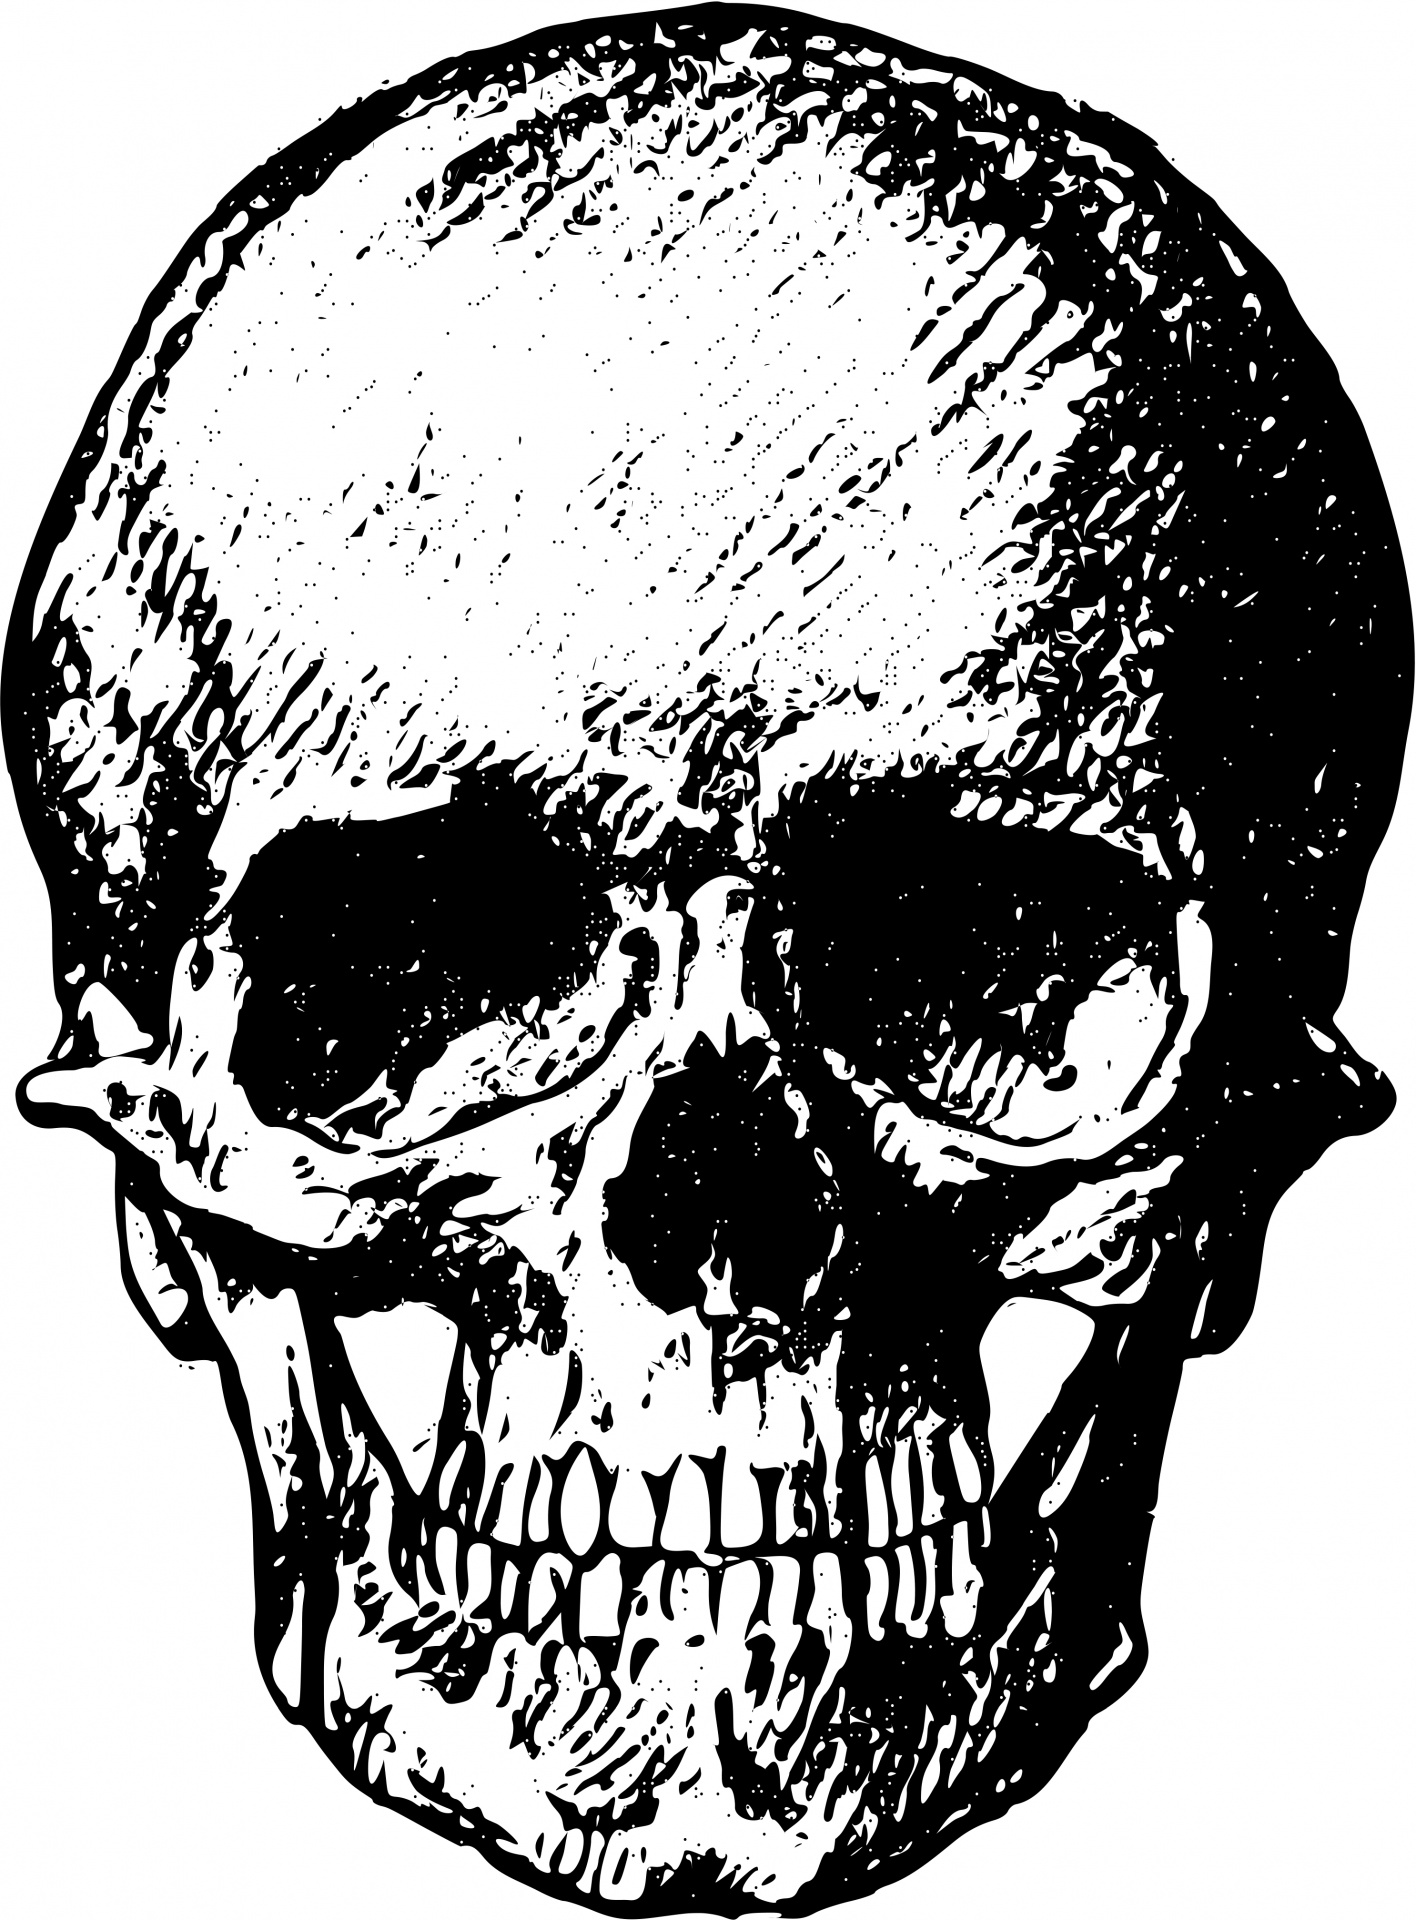 human-skull-1443448437d1n.jpg